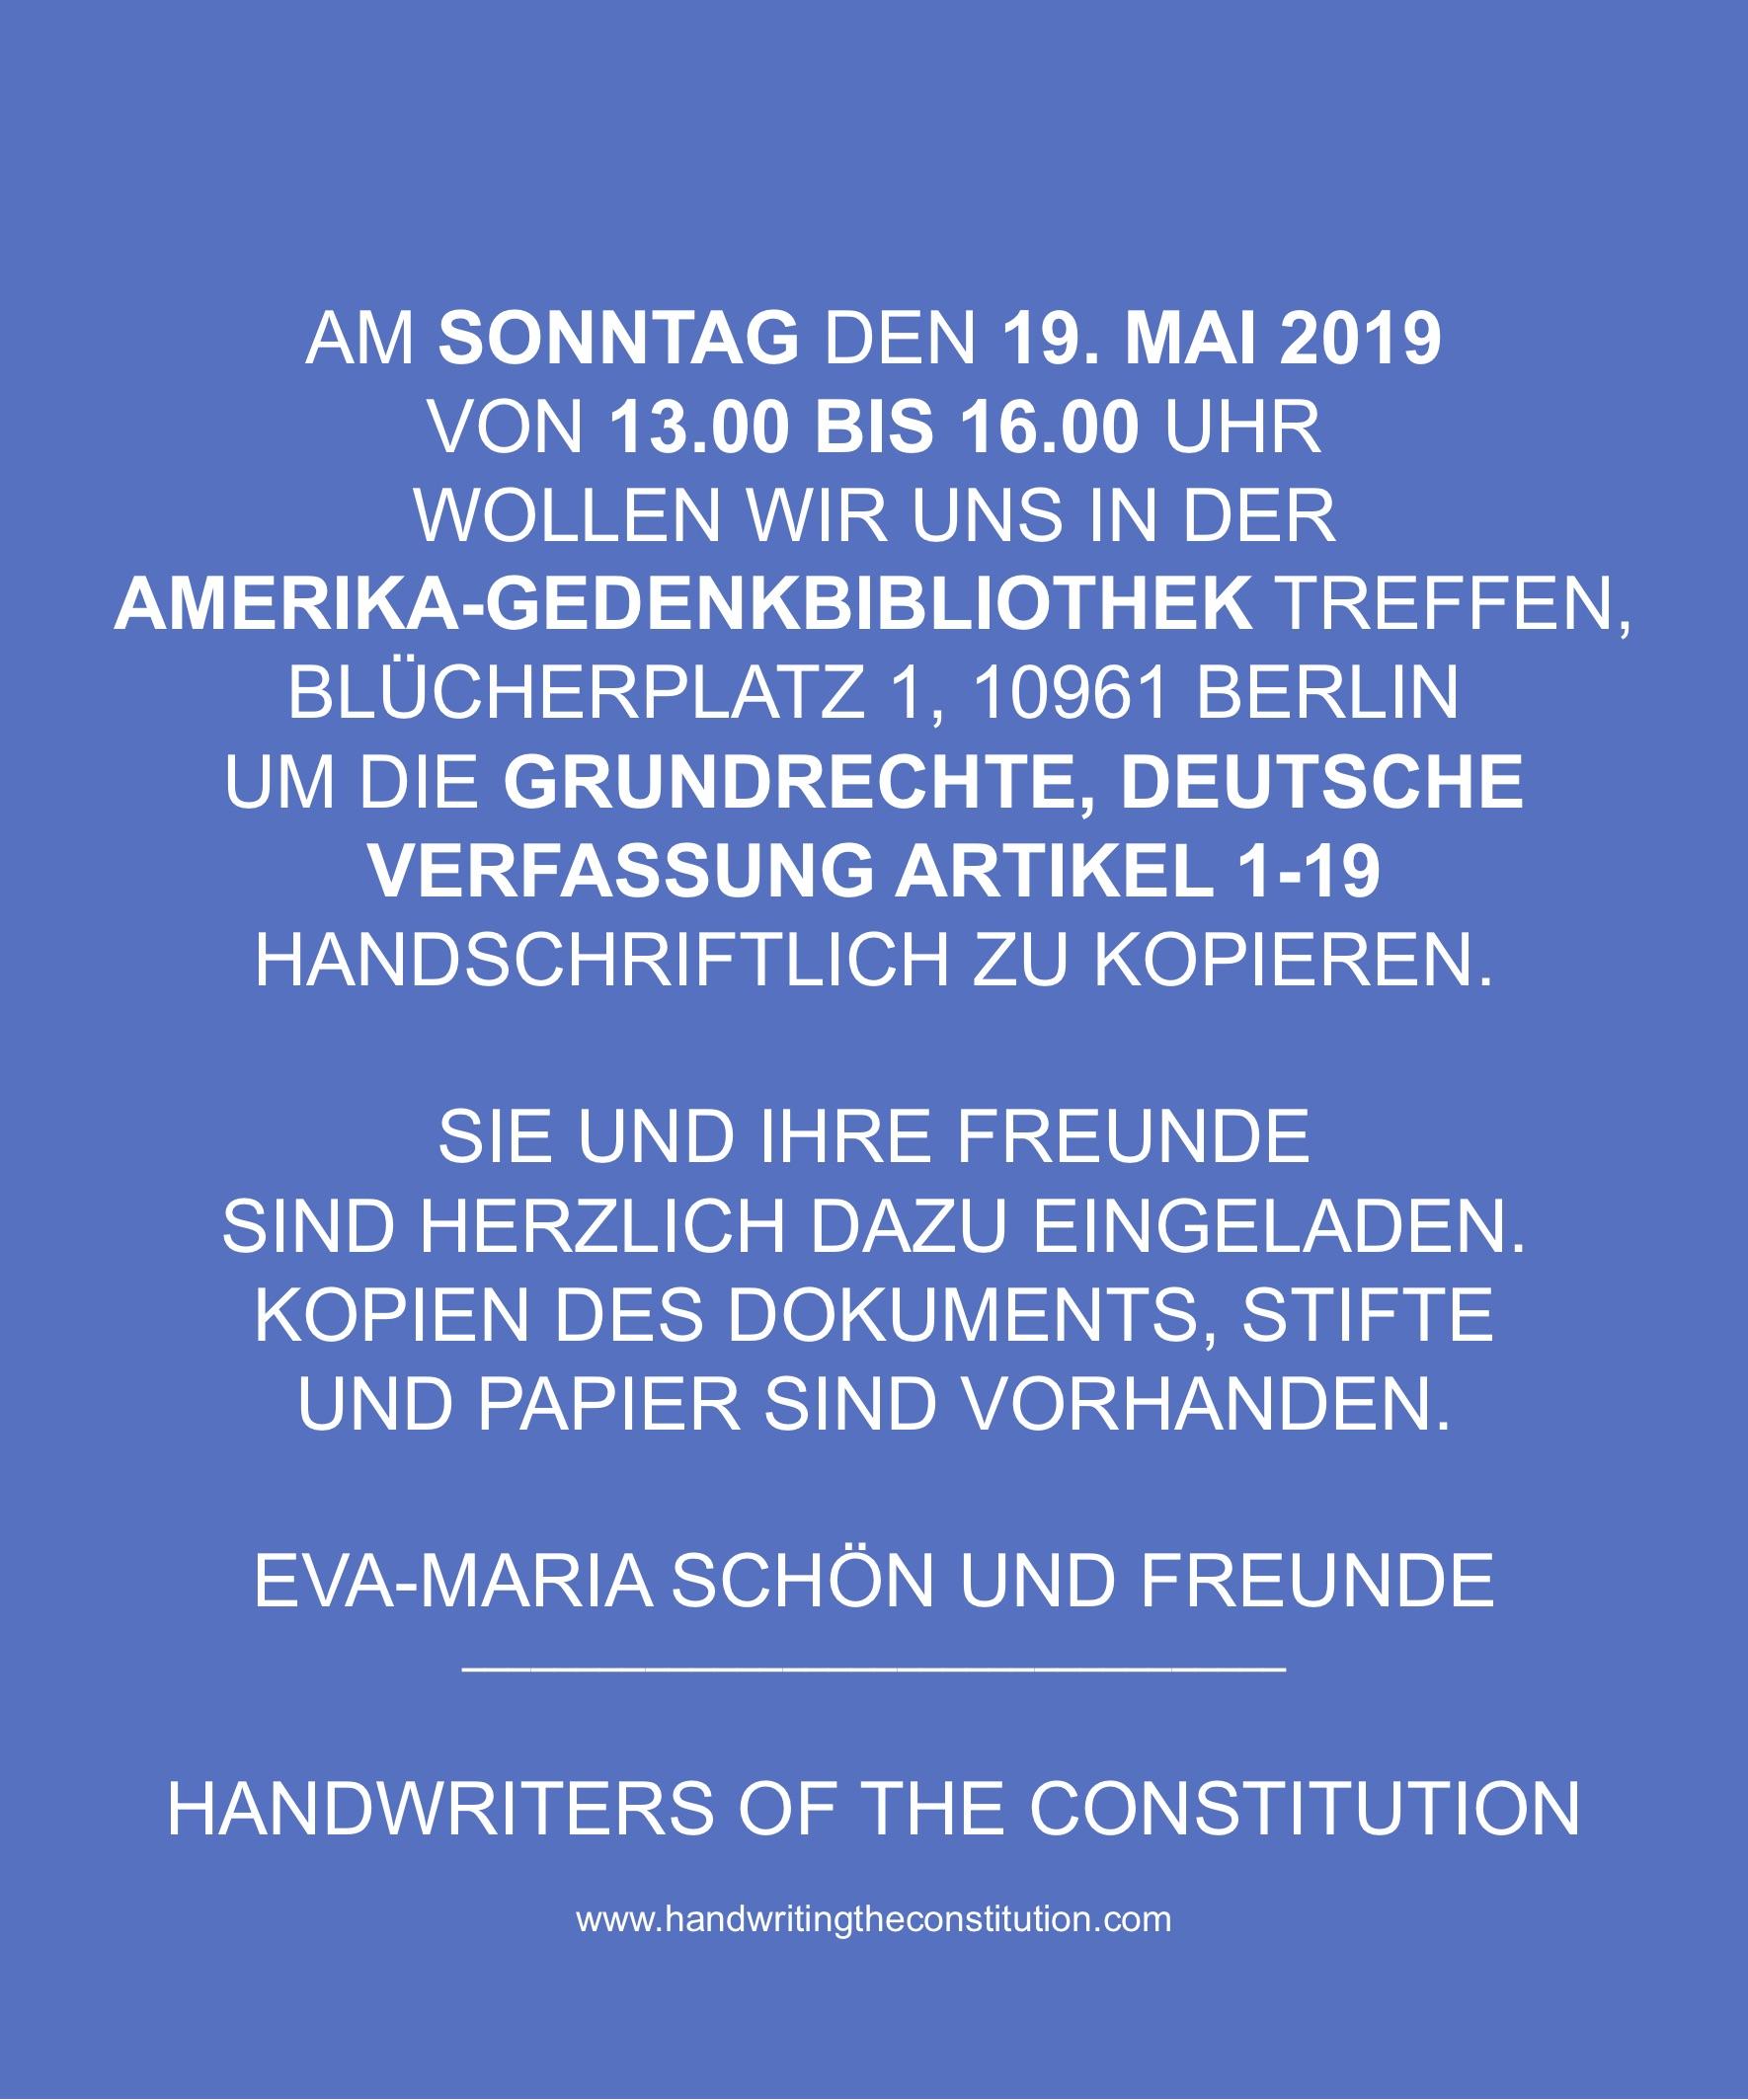 19 MAY 2019berlin, germany - session 102collaborator eva-maria schön